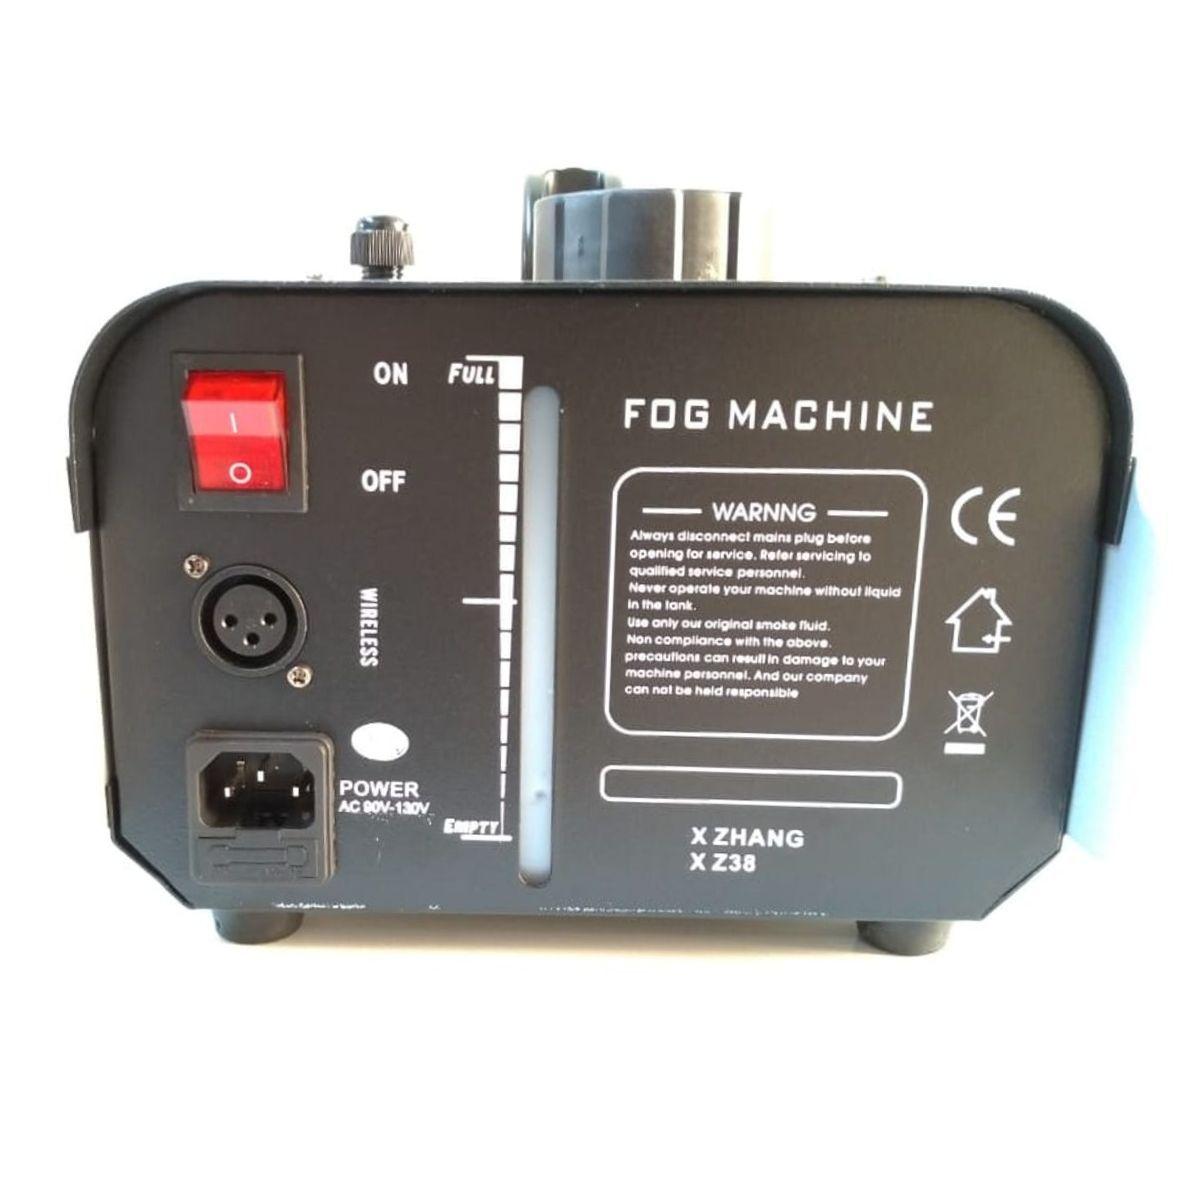 Kit Máquina de Fumaça 1200W 6 Leds RGB + 2x Líquido 1L - XH-1200W+MY1012